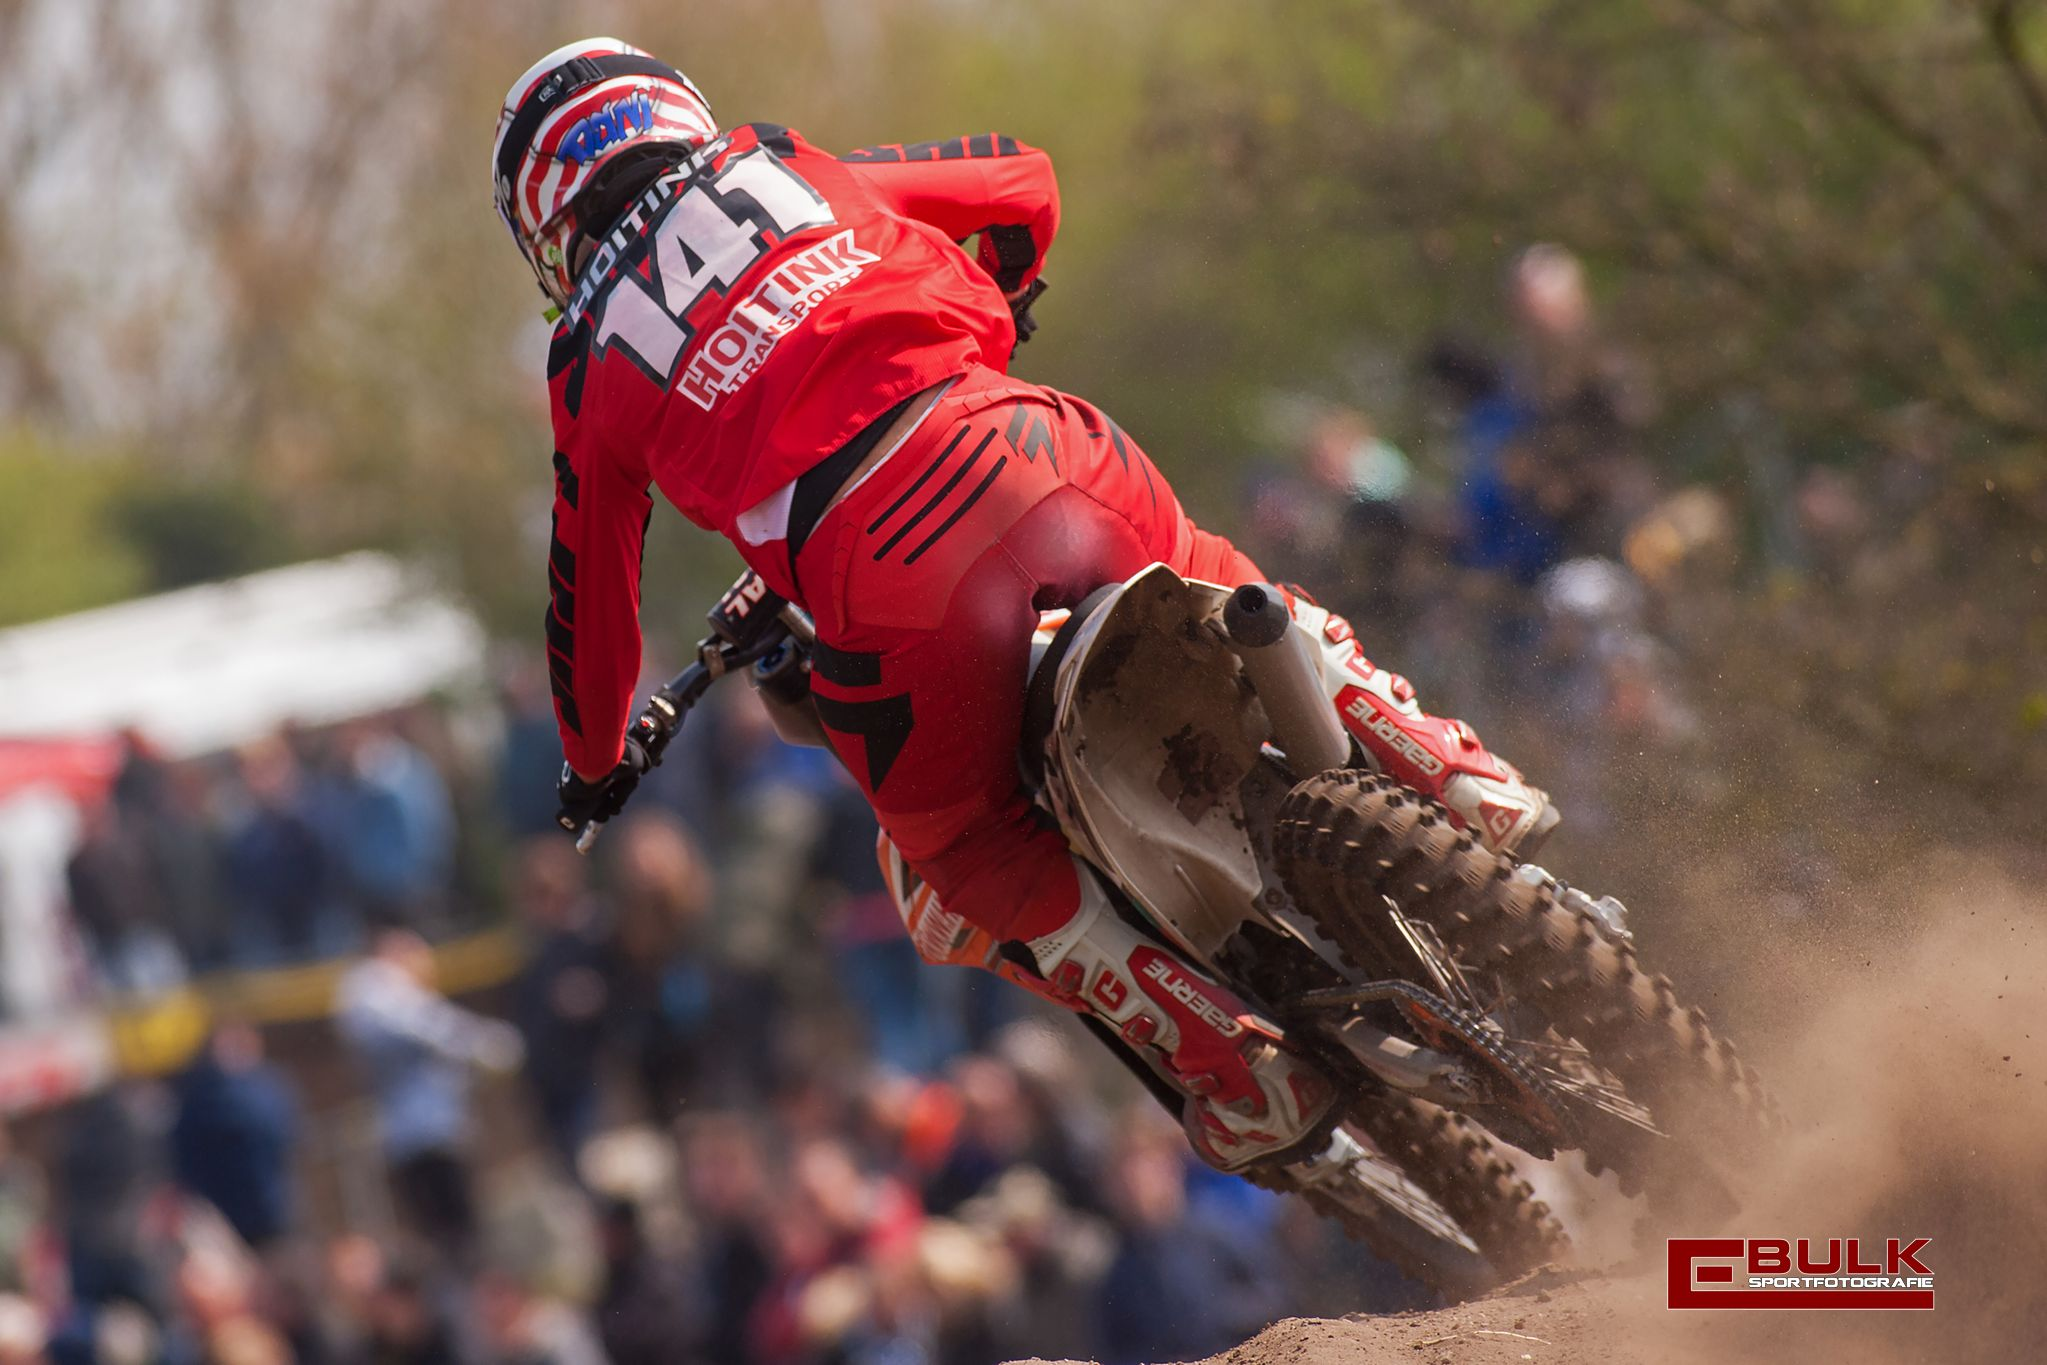 ebs_1005-ed_bulk_sportfotografie